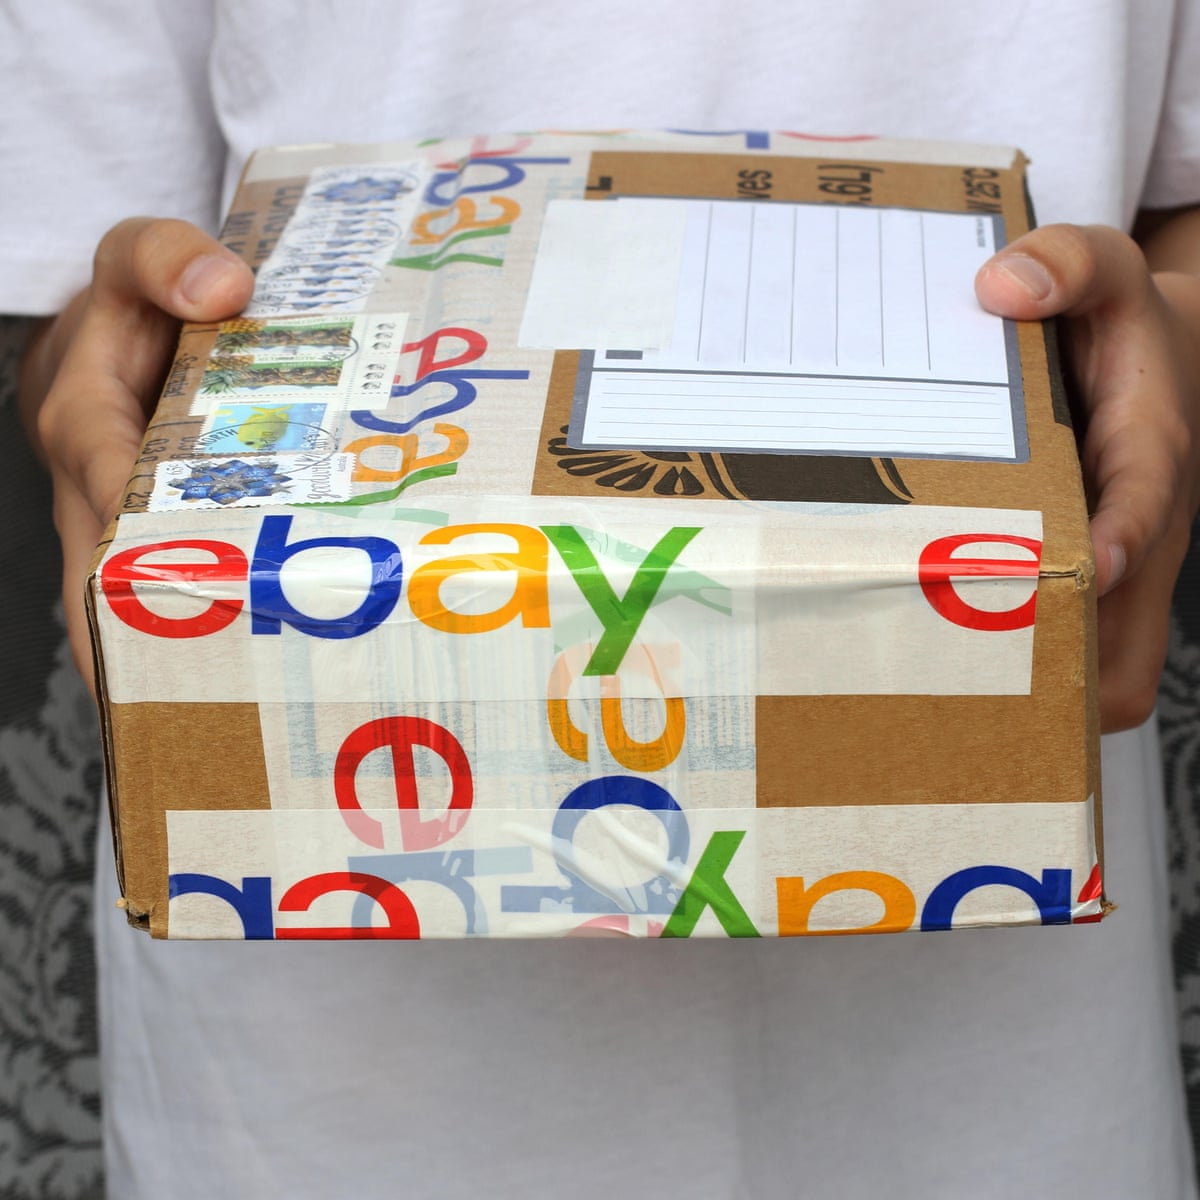 eBay pakket in handen